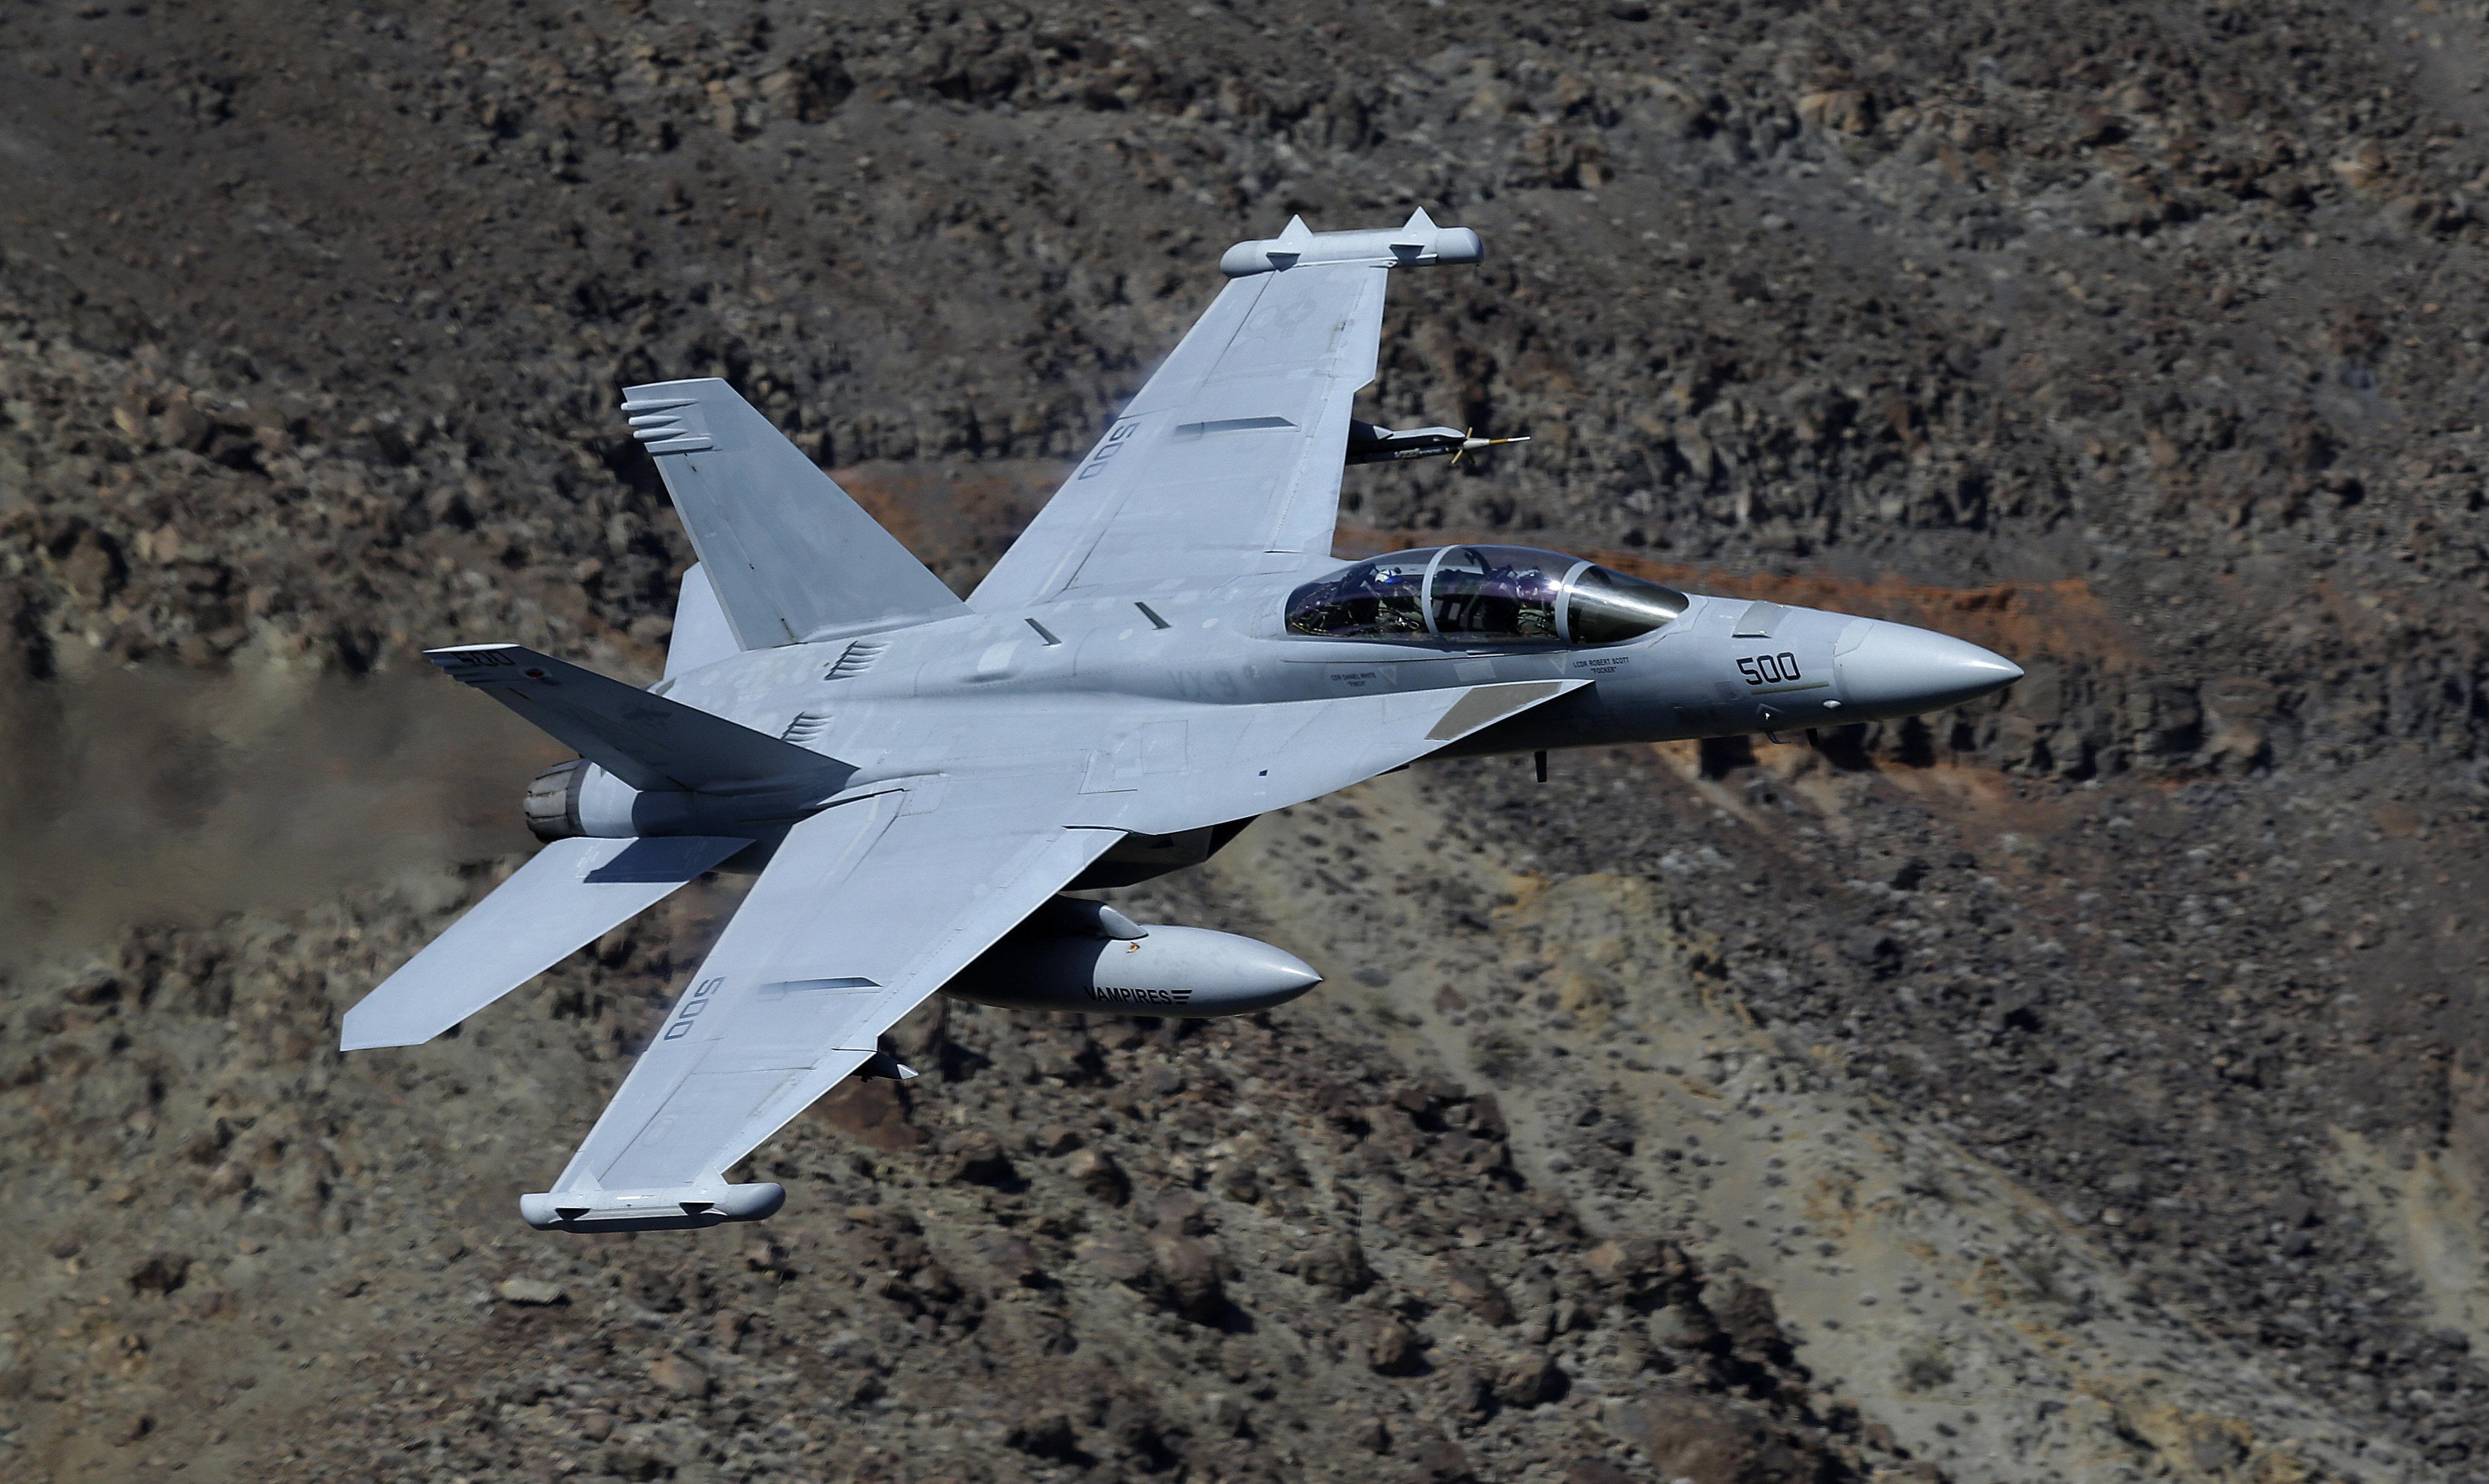 Un avión EA-18G Growler